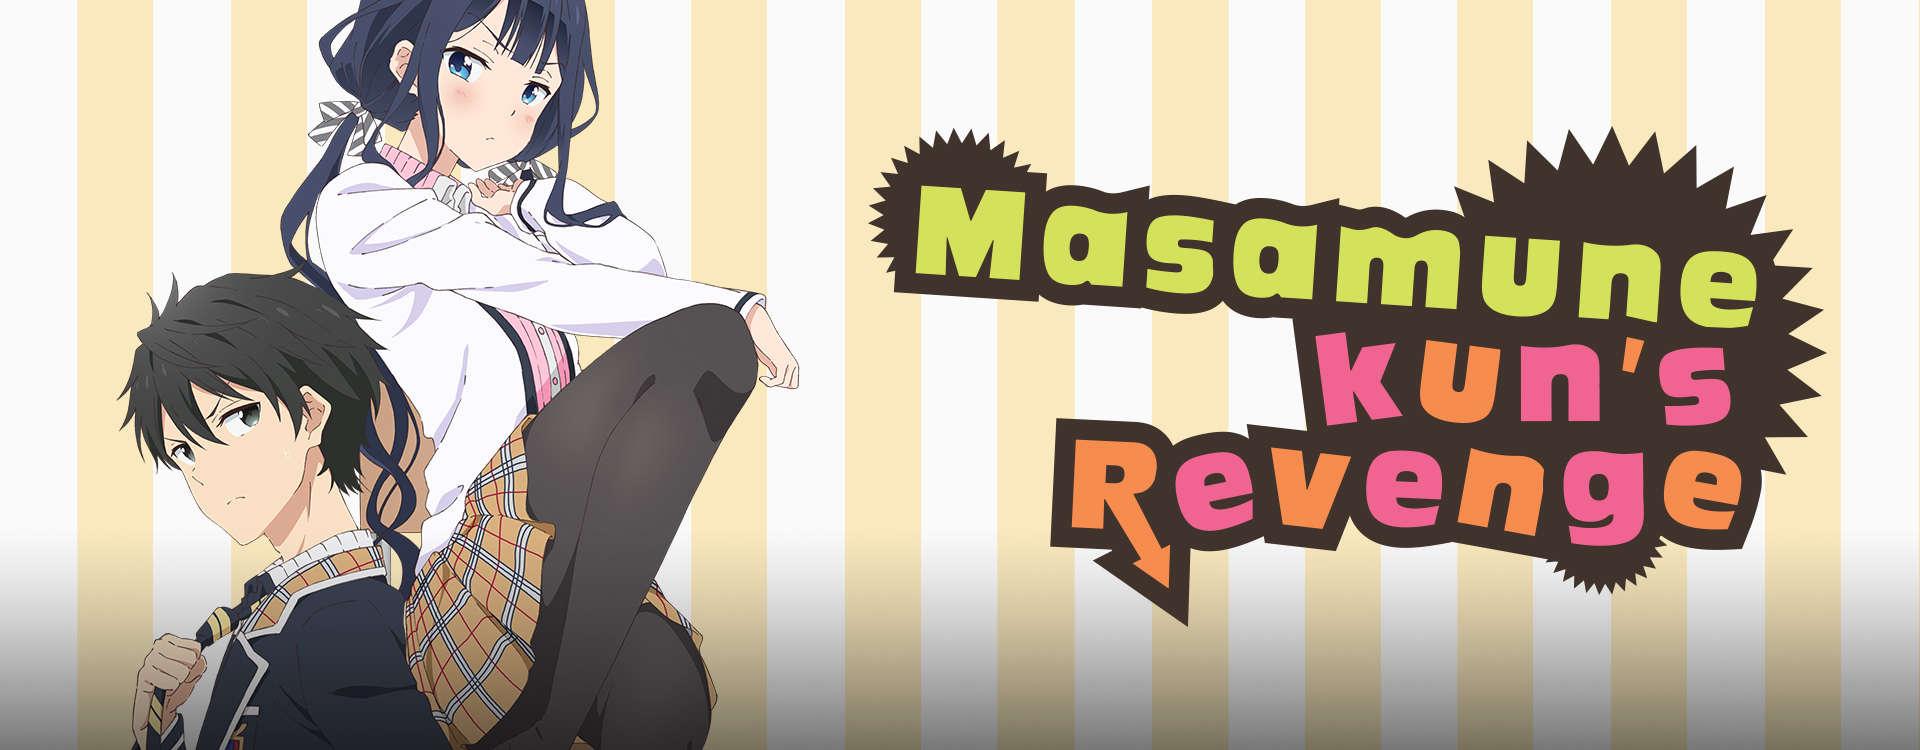 Serien Stream Masamune Kun No Revenge